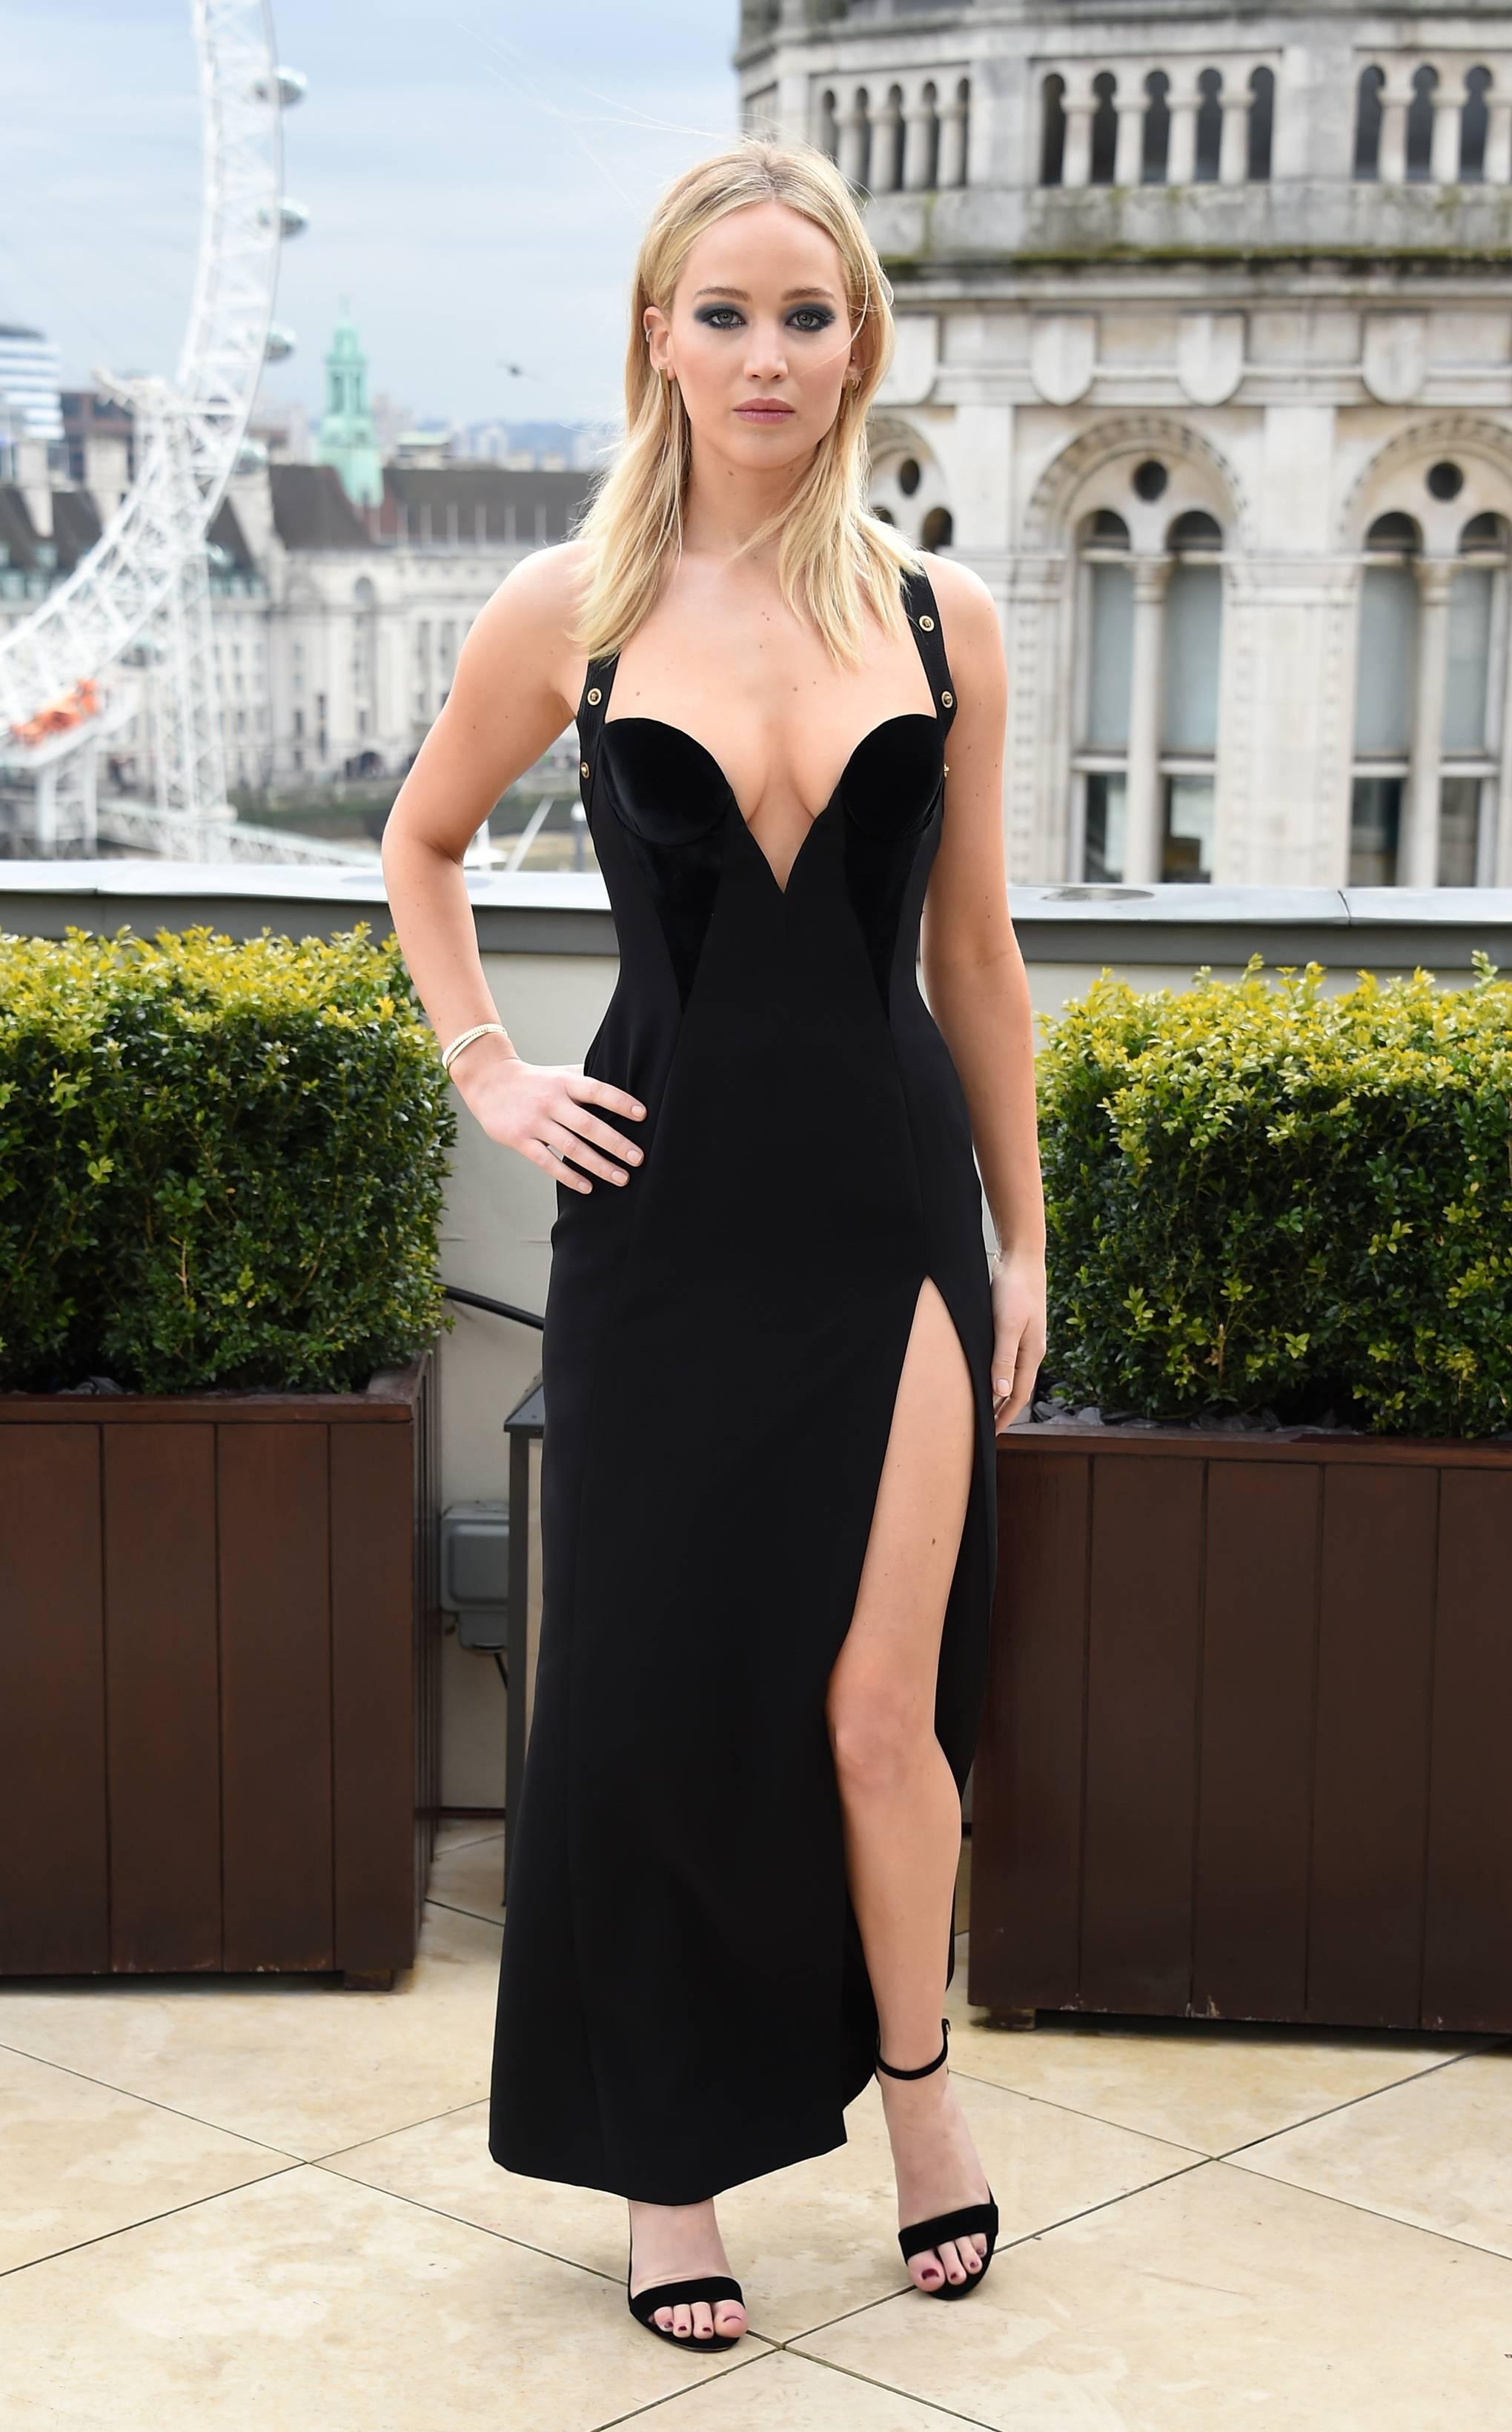 79fdfa5d555e Jennifer Lawrence Responds To Dress Controversy